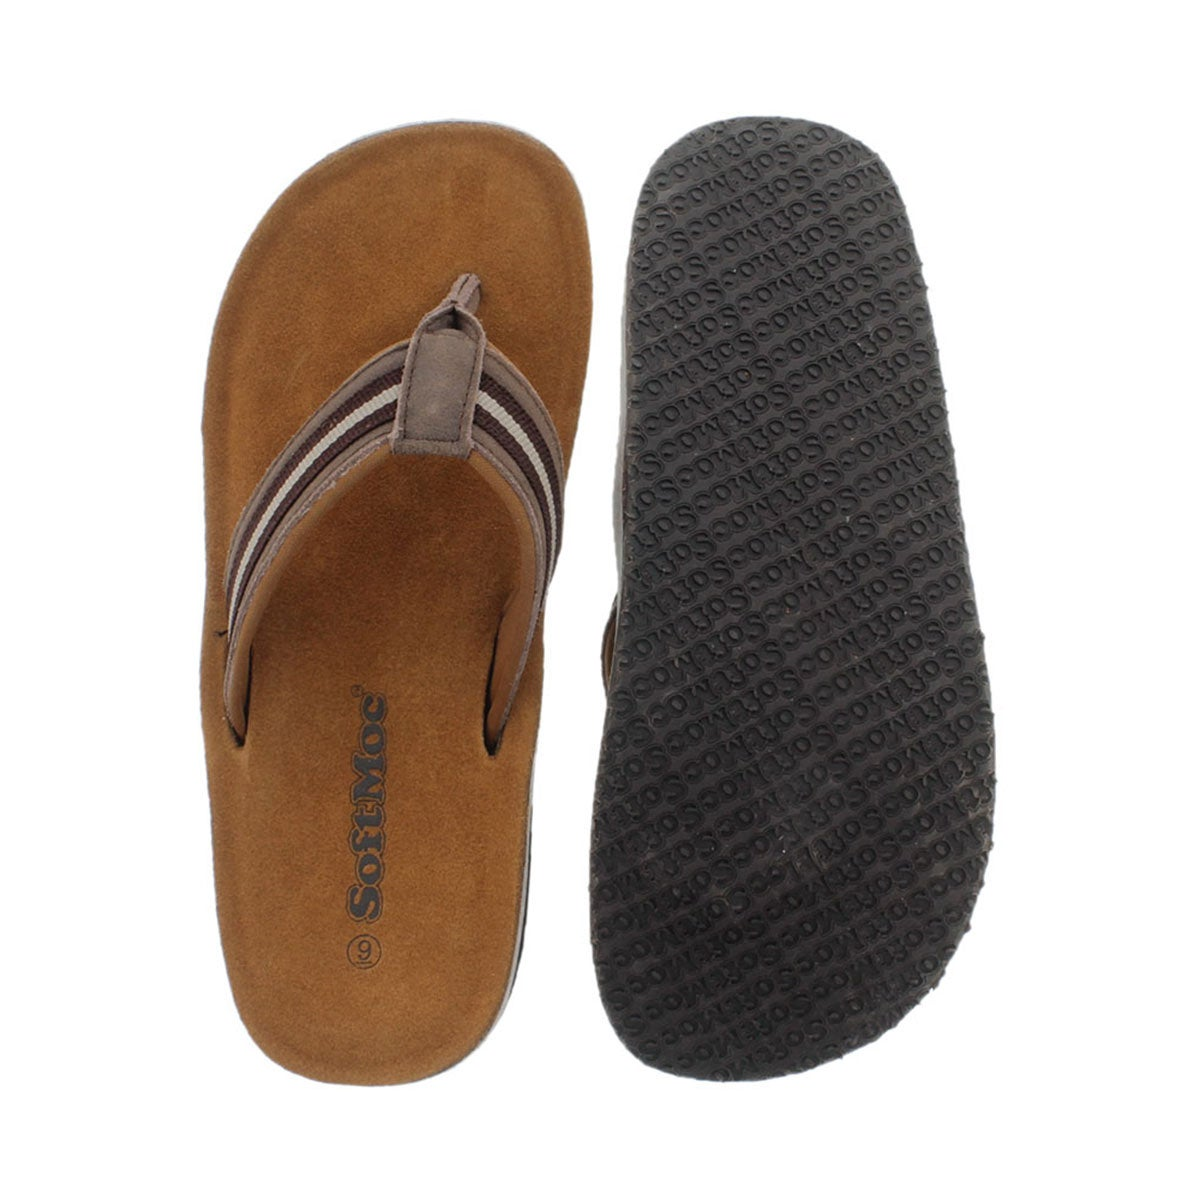 Mns Reese brown memory foam thong sandal